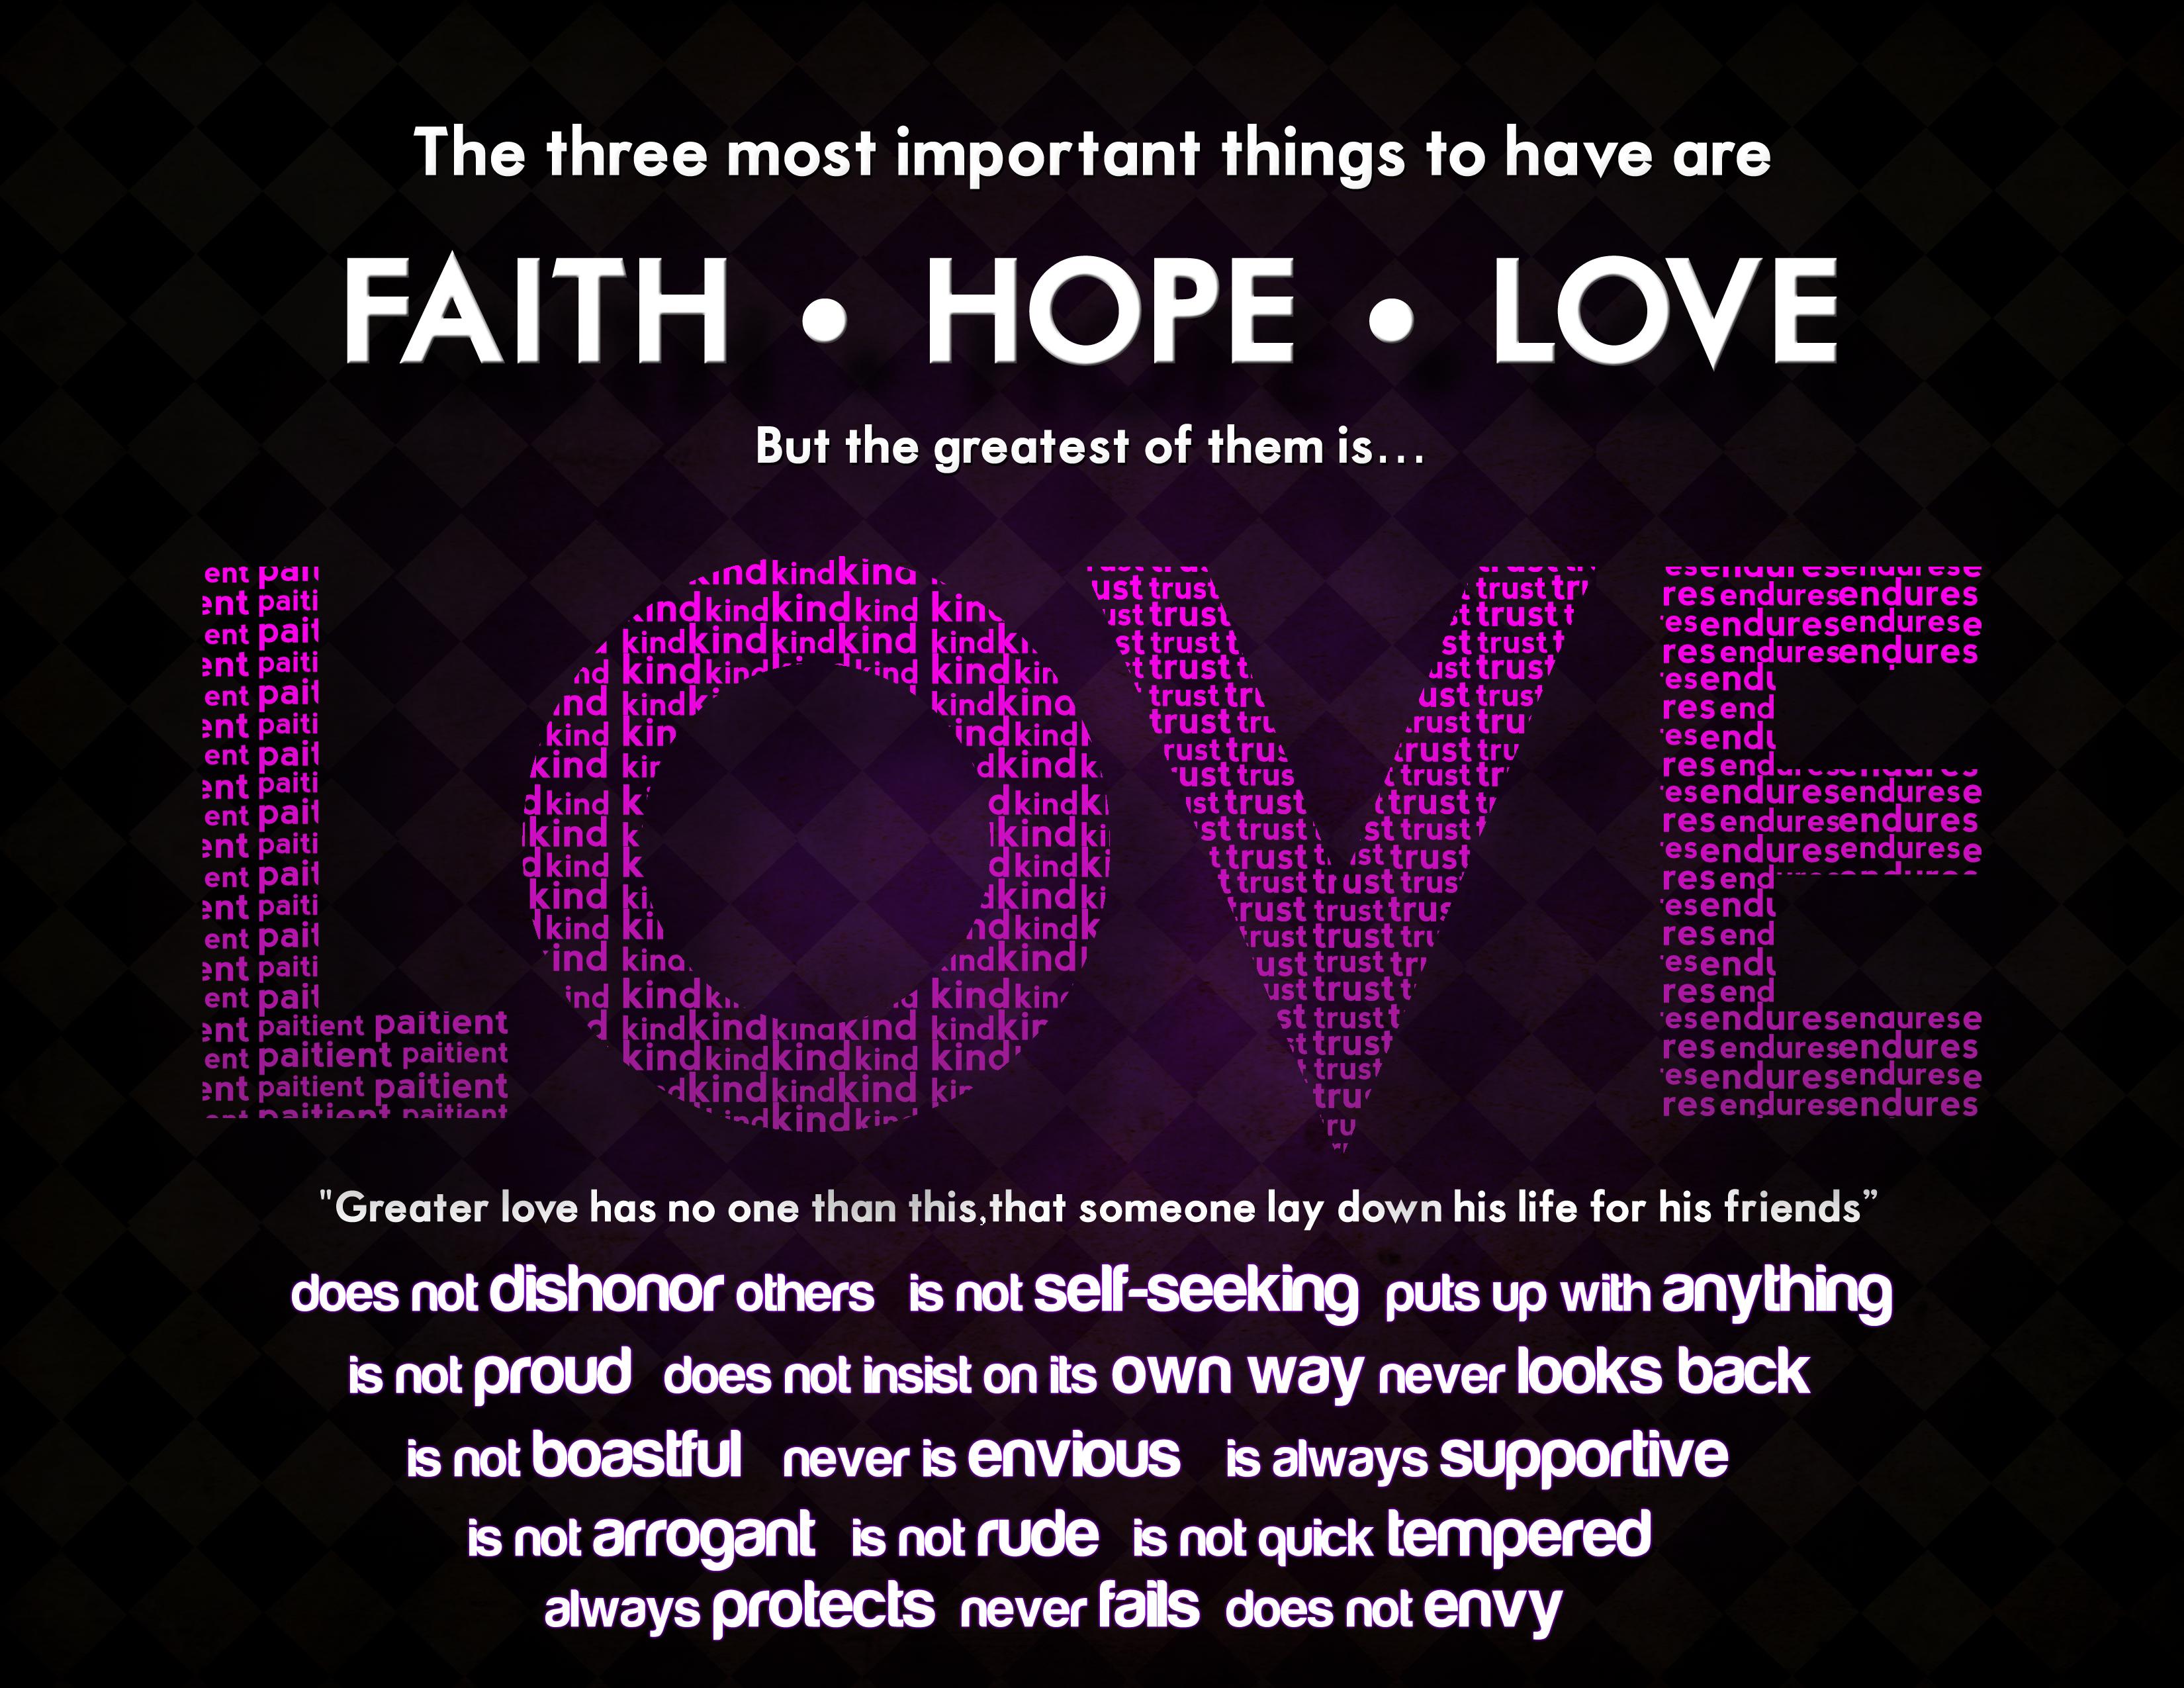 Inspirational Quotes About Faith And Love Faithlovehope  Faith Romans 12 12 And Romans 12